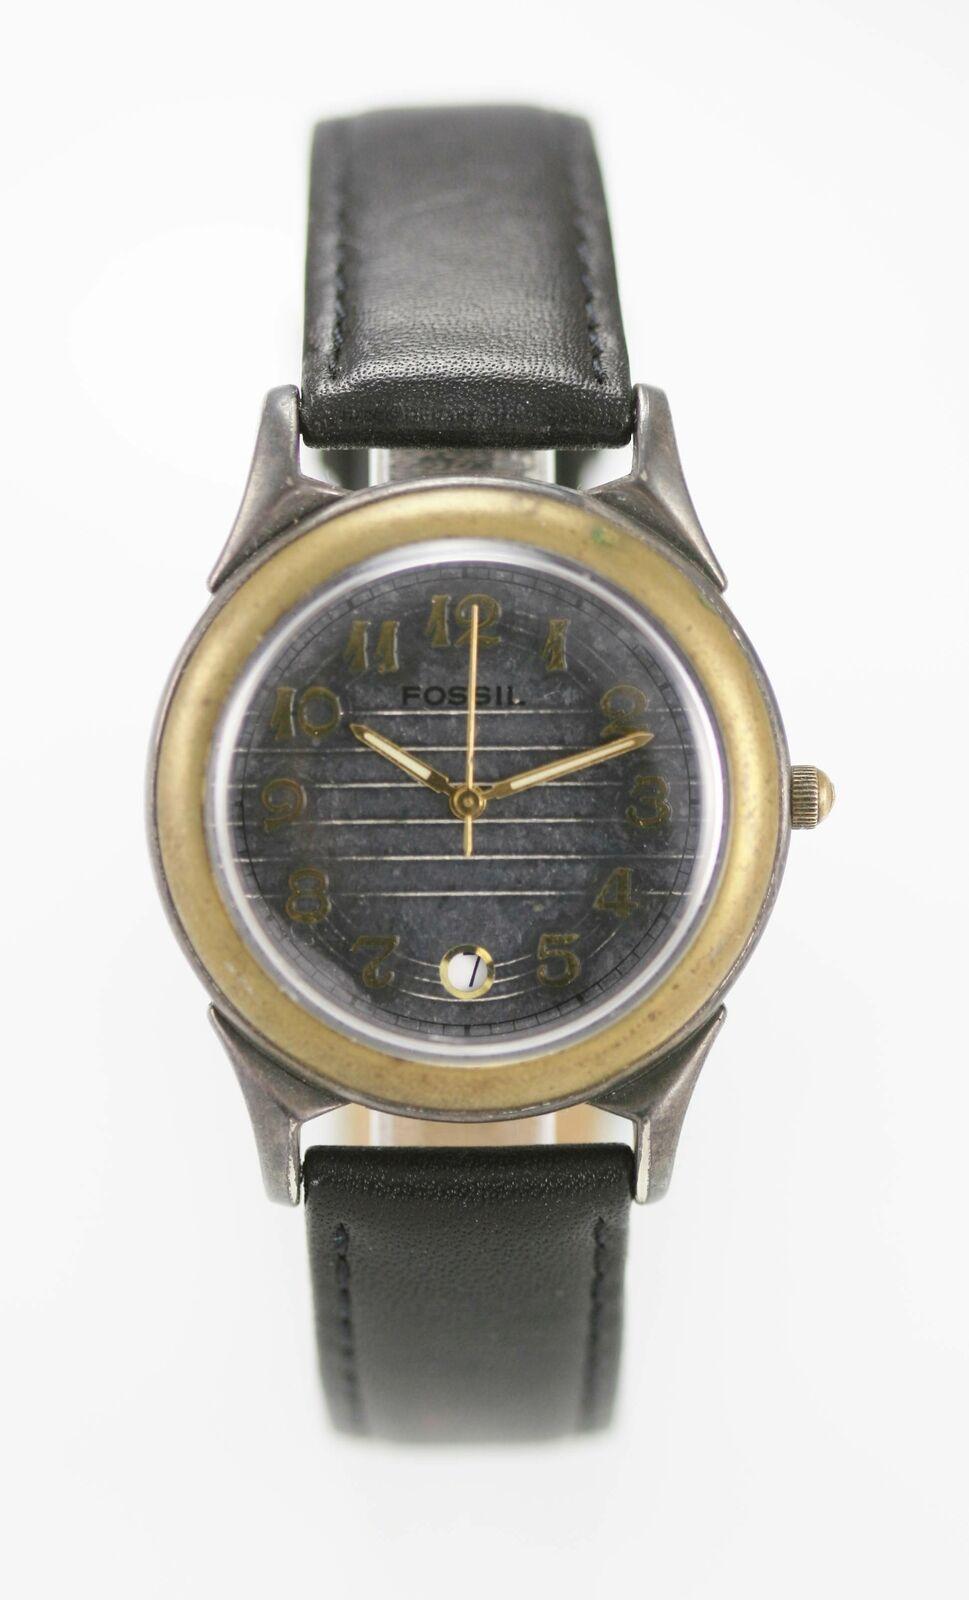 Fossil Watch Mens Stainless Silver Gold Black Leather 30m Date Batt Gray Quartz - $33.45